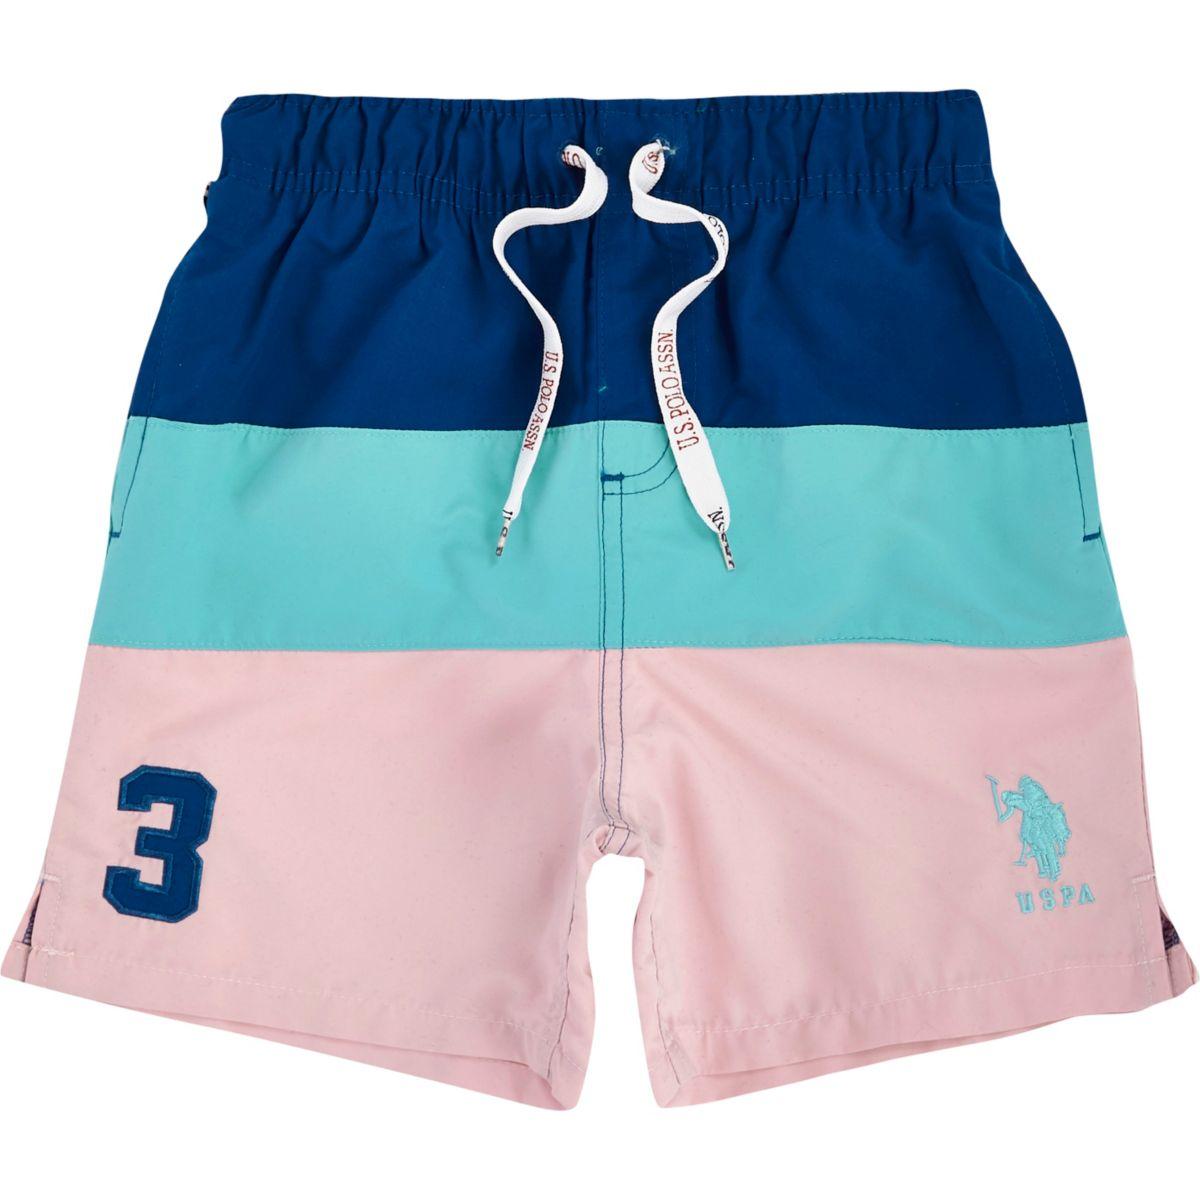 Boys pink U.S. Polo Assn. blocked swim trunks